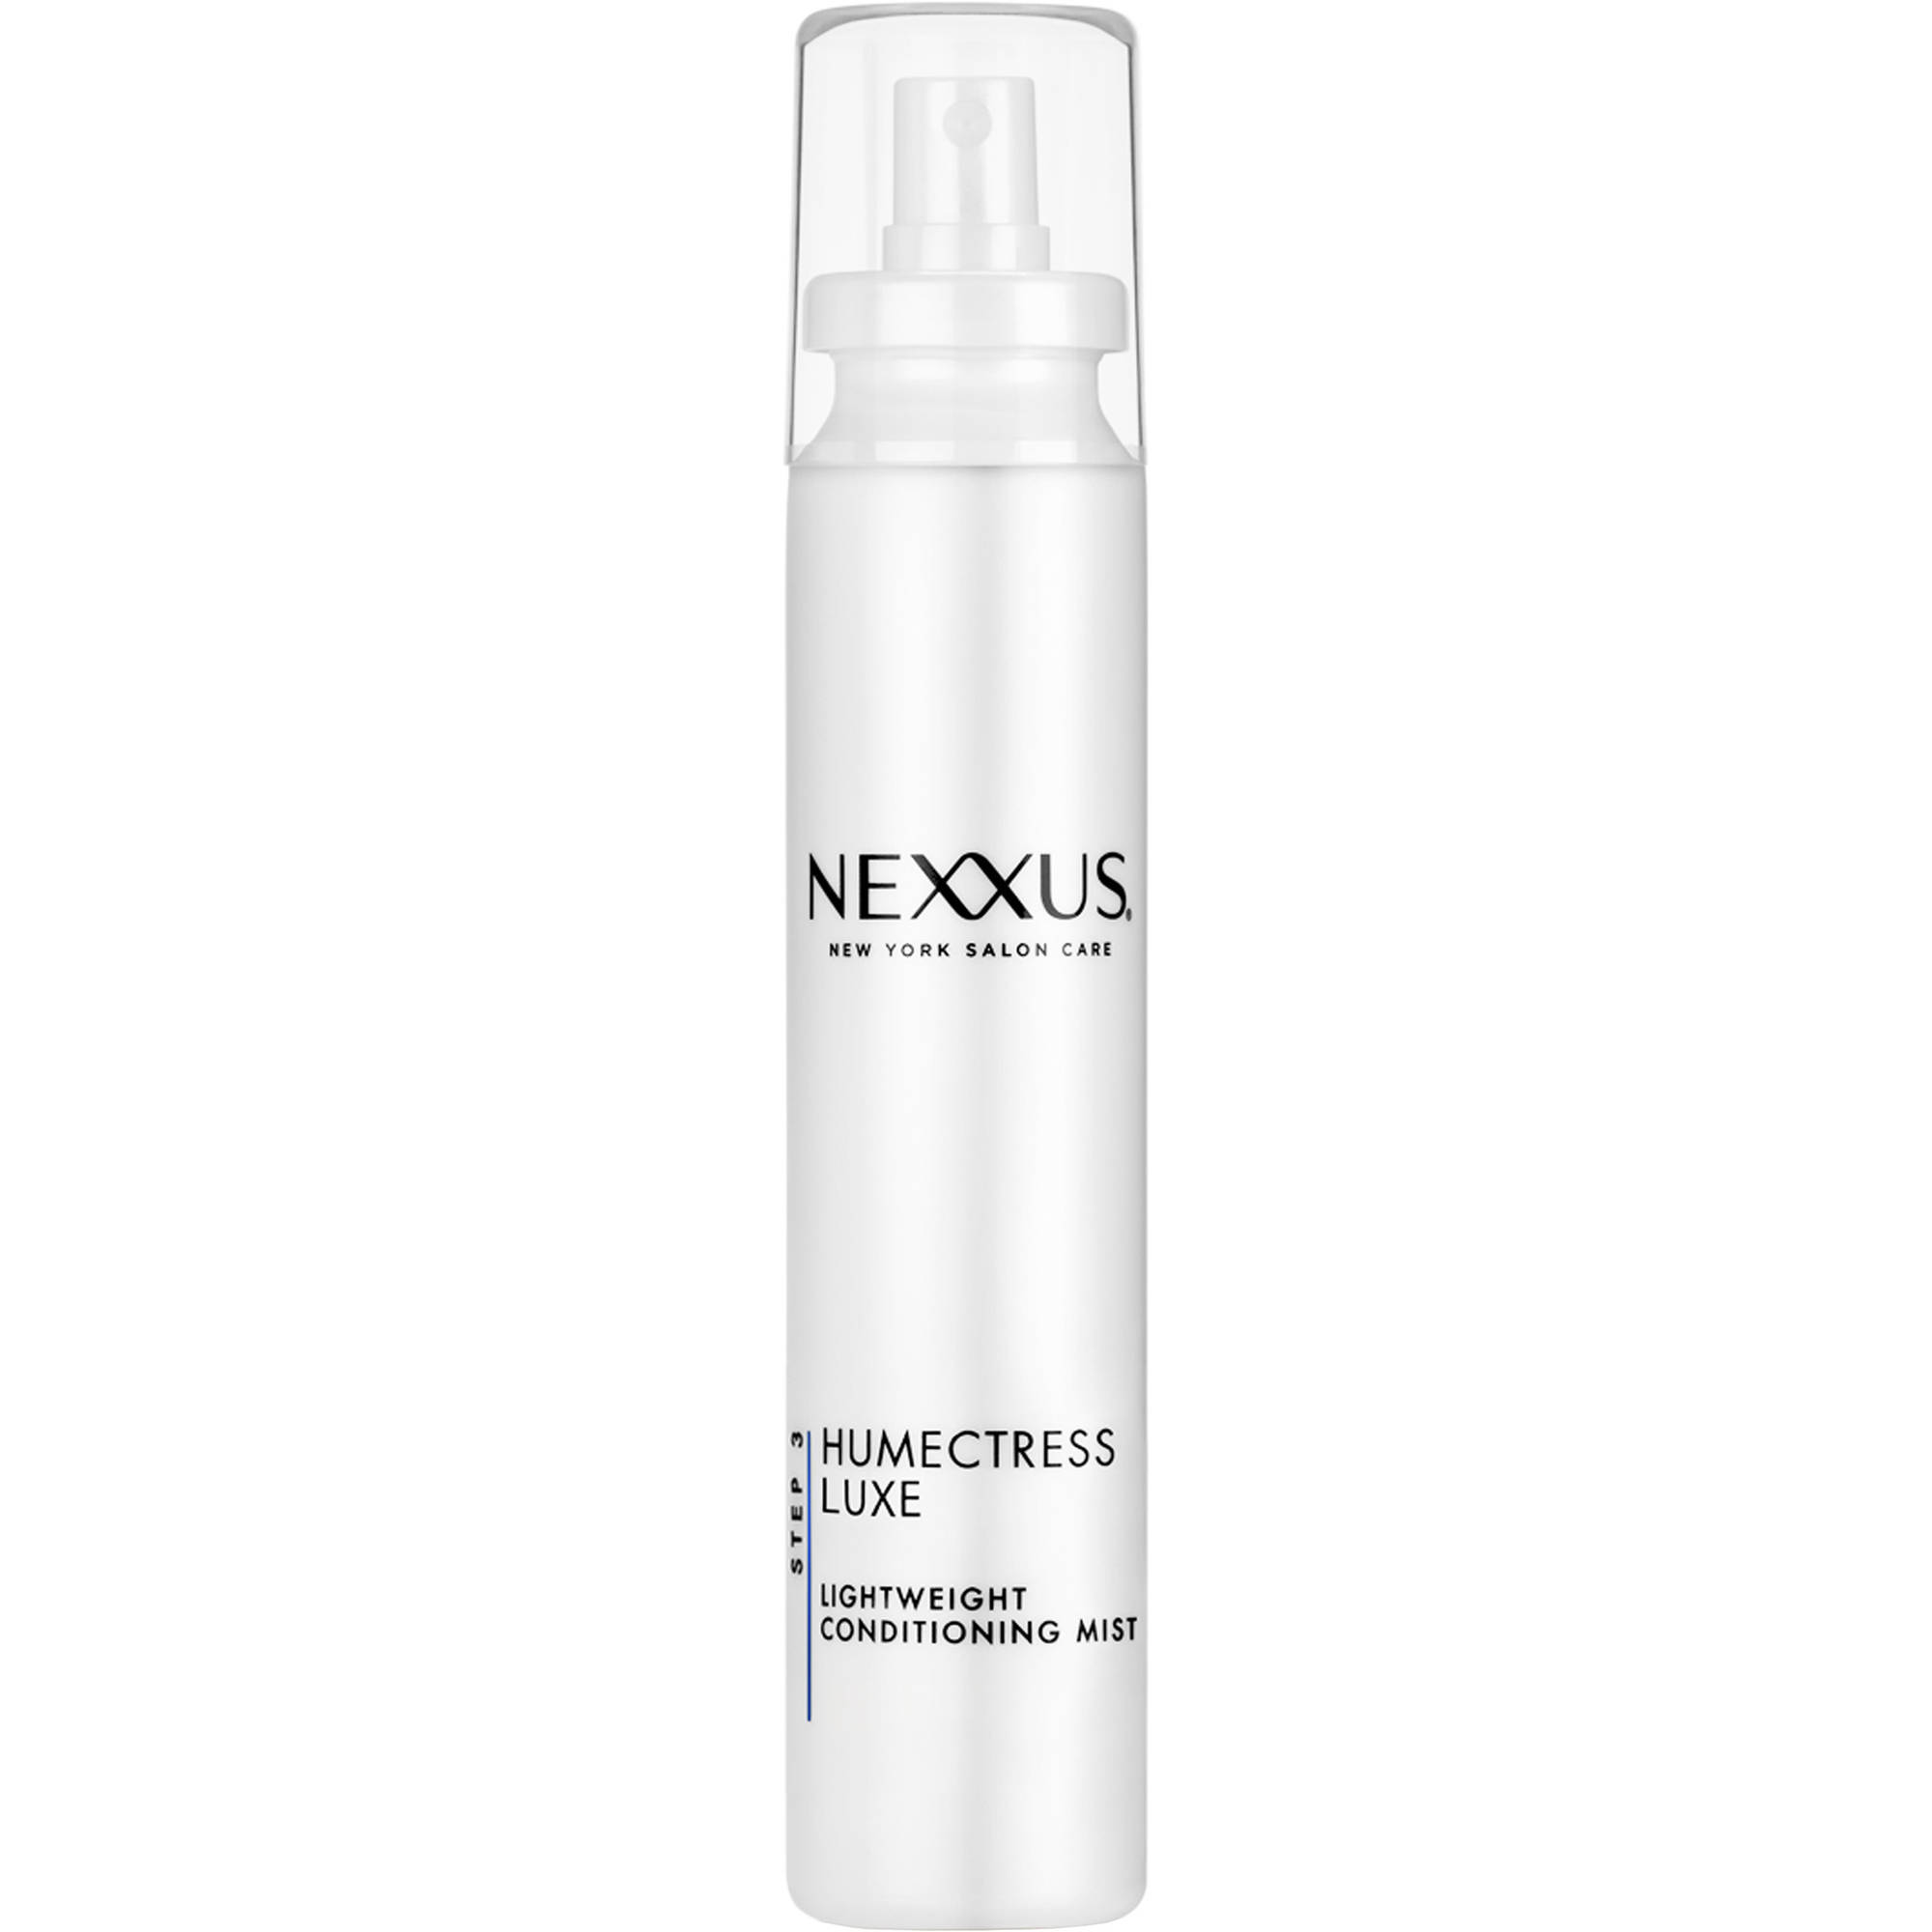 Nexxus Humectress Luxe Lightweight Conditioning Mist, 5.1 oz